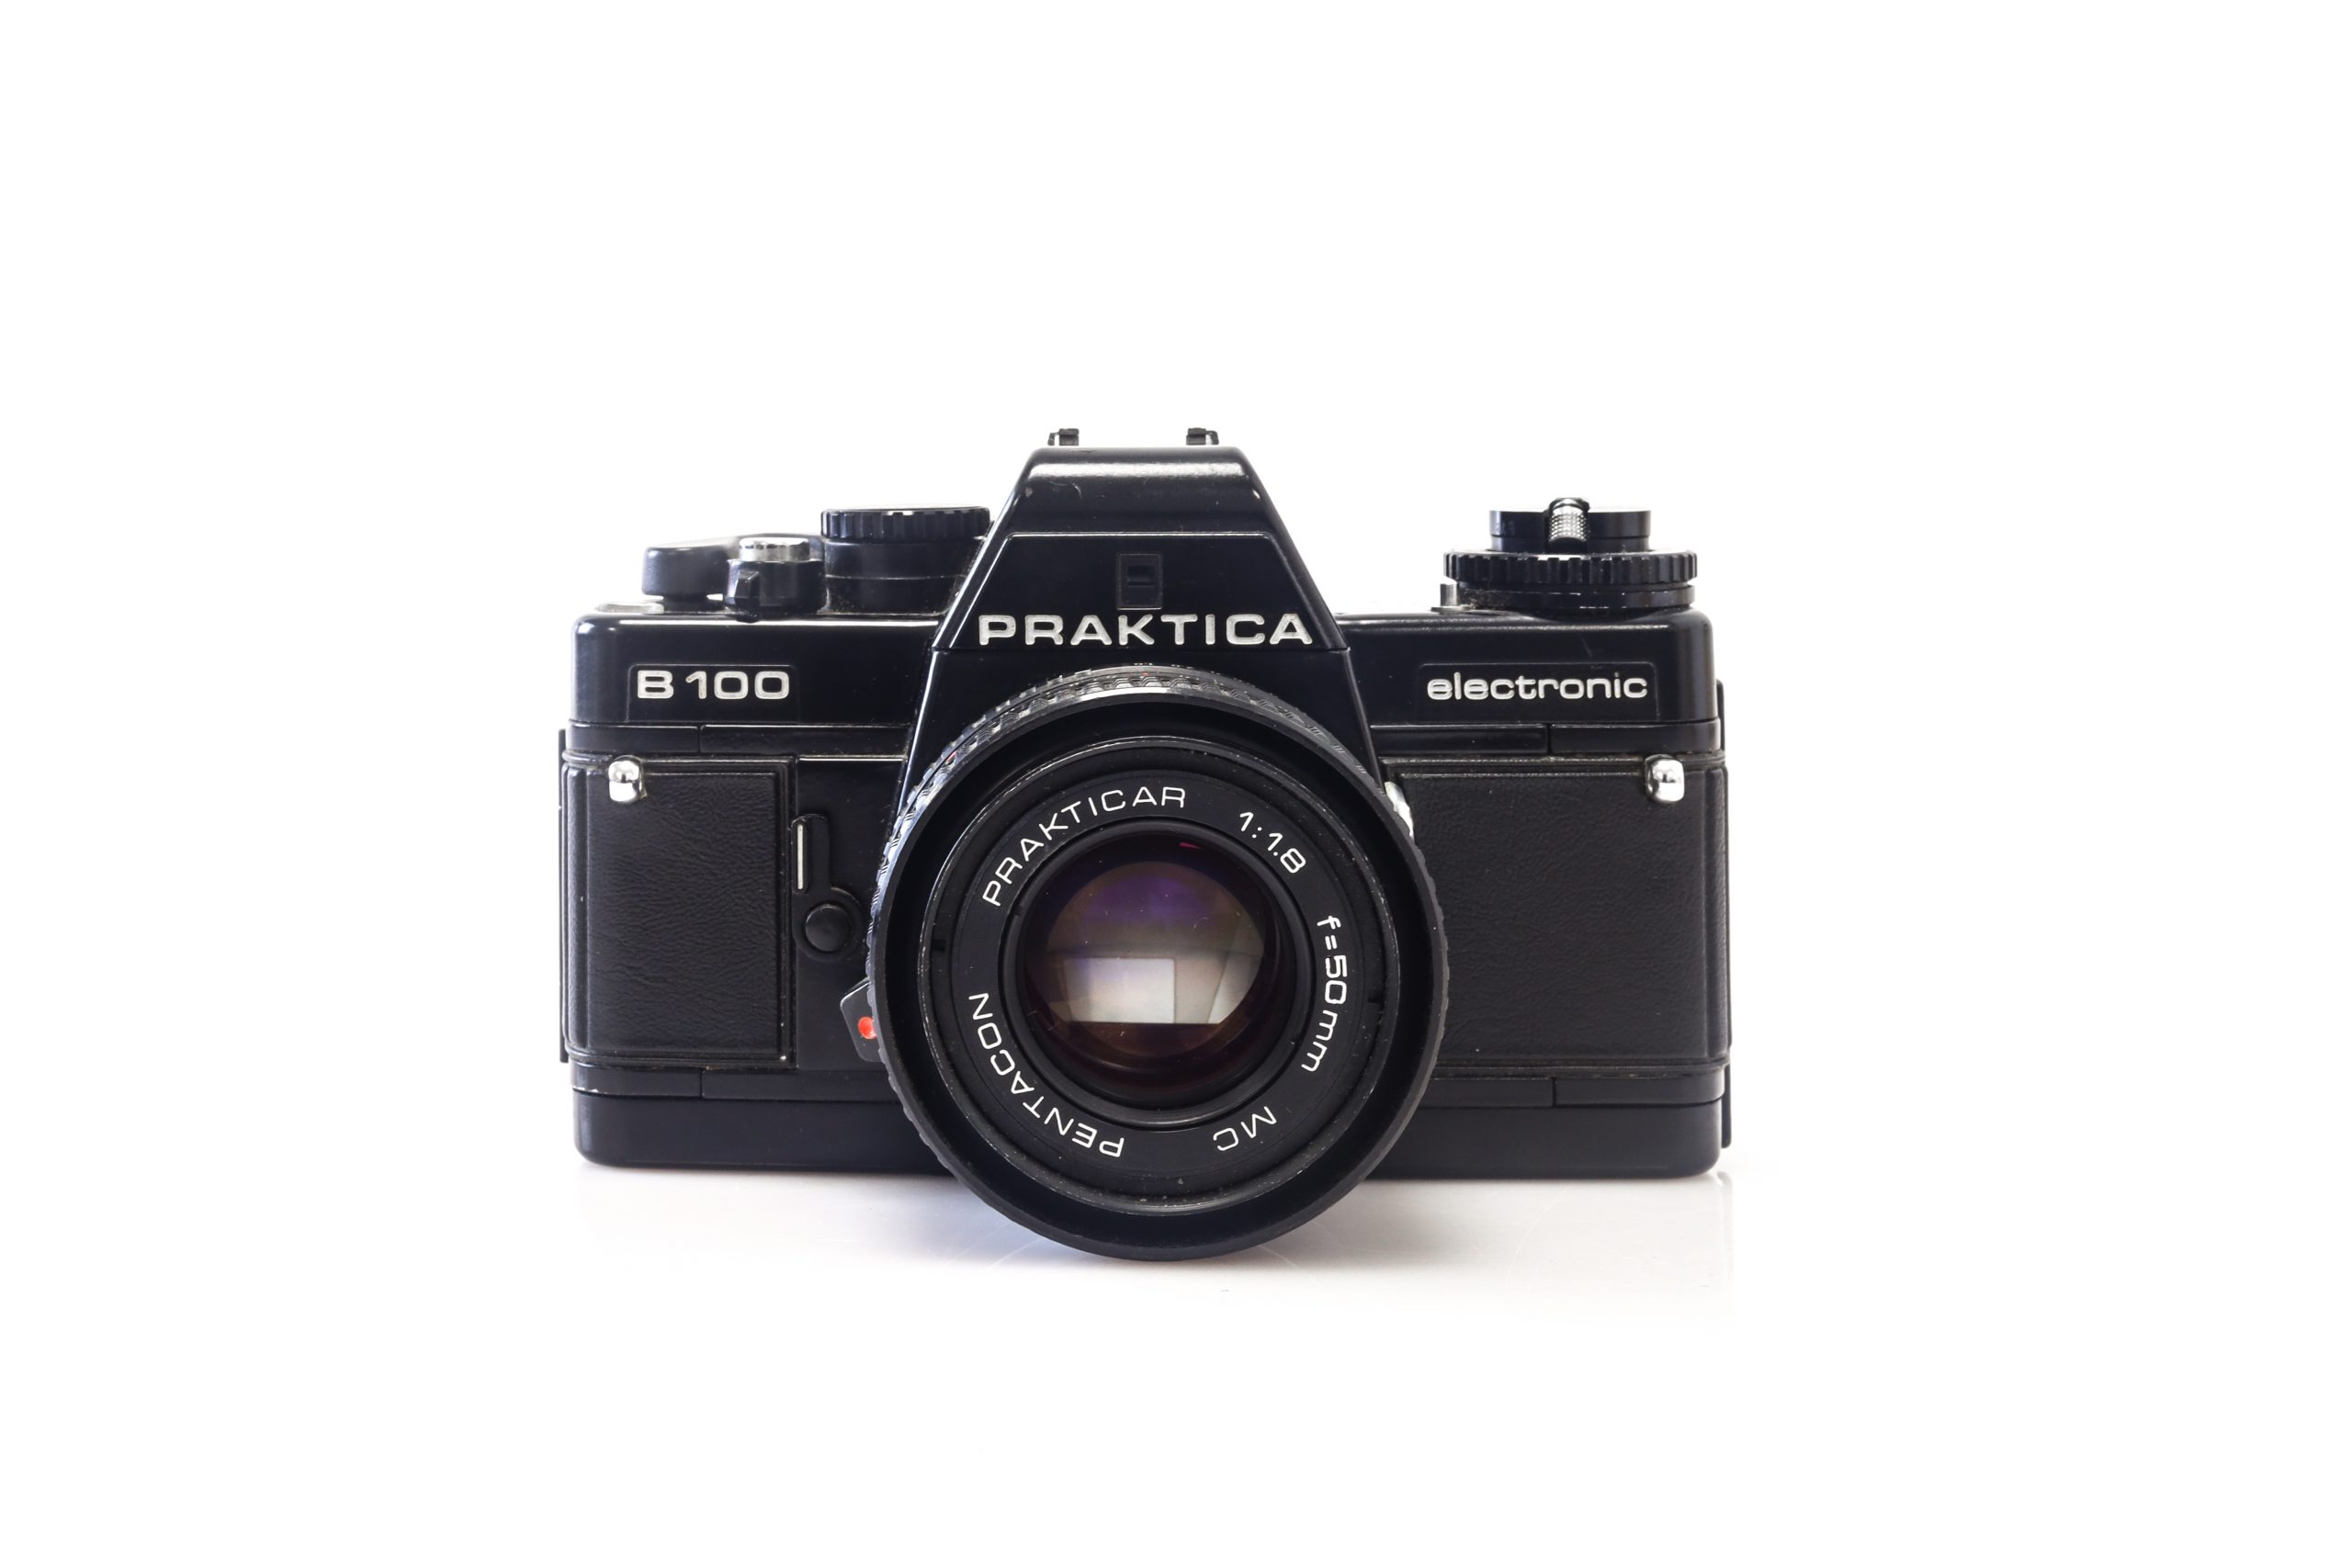 Beautiful Praktica B100 35mm Film Camera with Pentacon 50mm F1.8 Lens